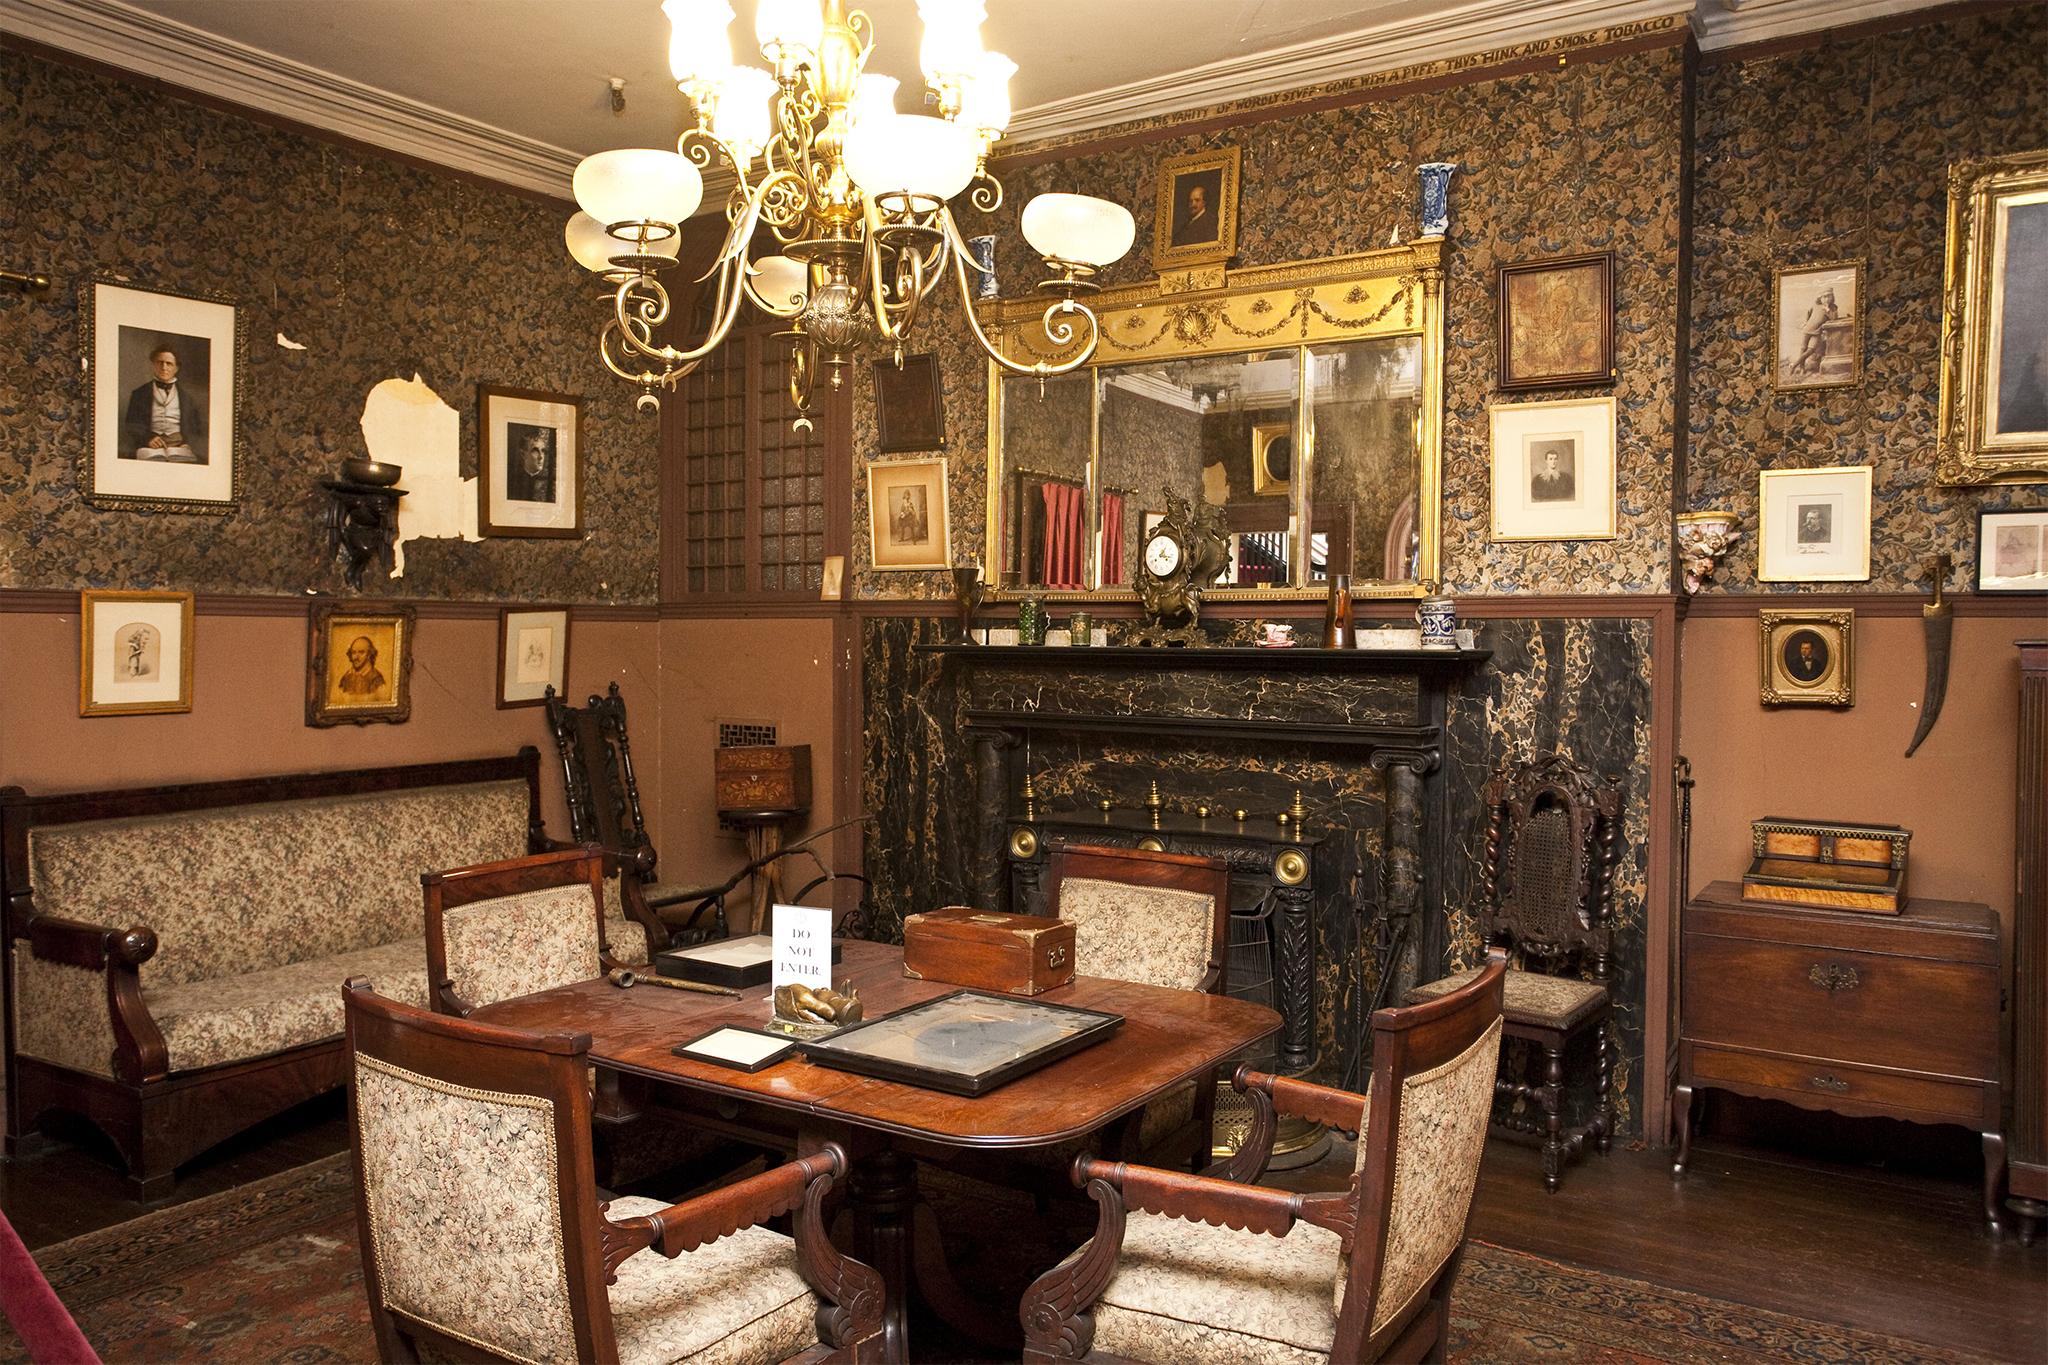 Edwin Booth's bedroom (slide show)